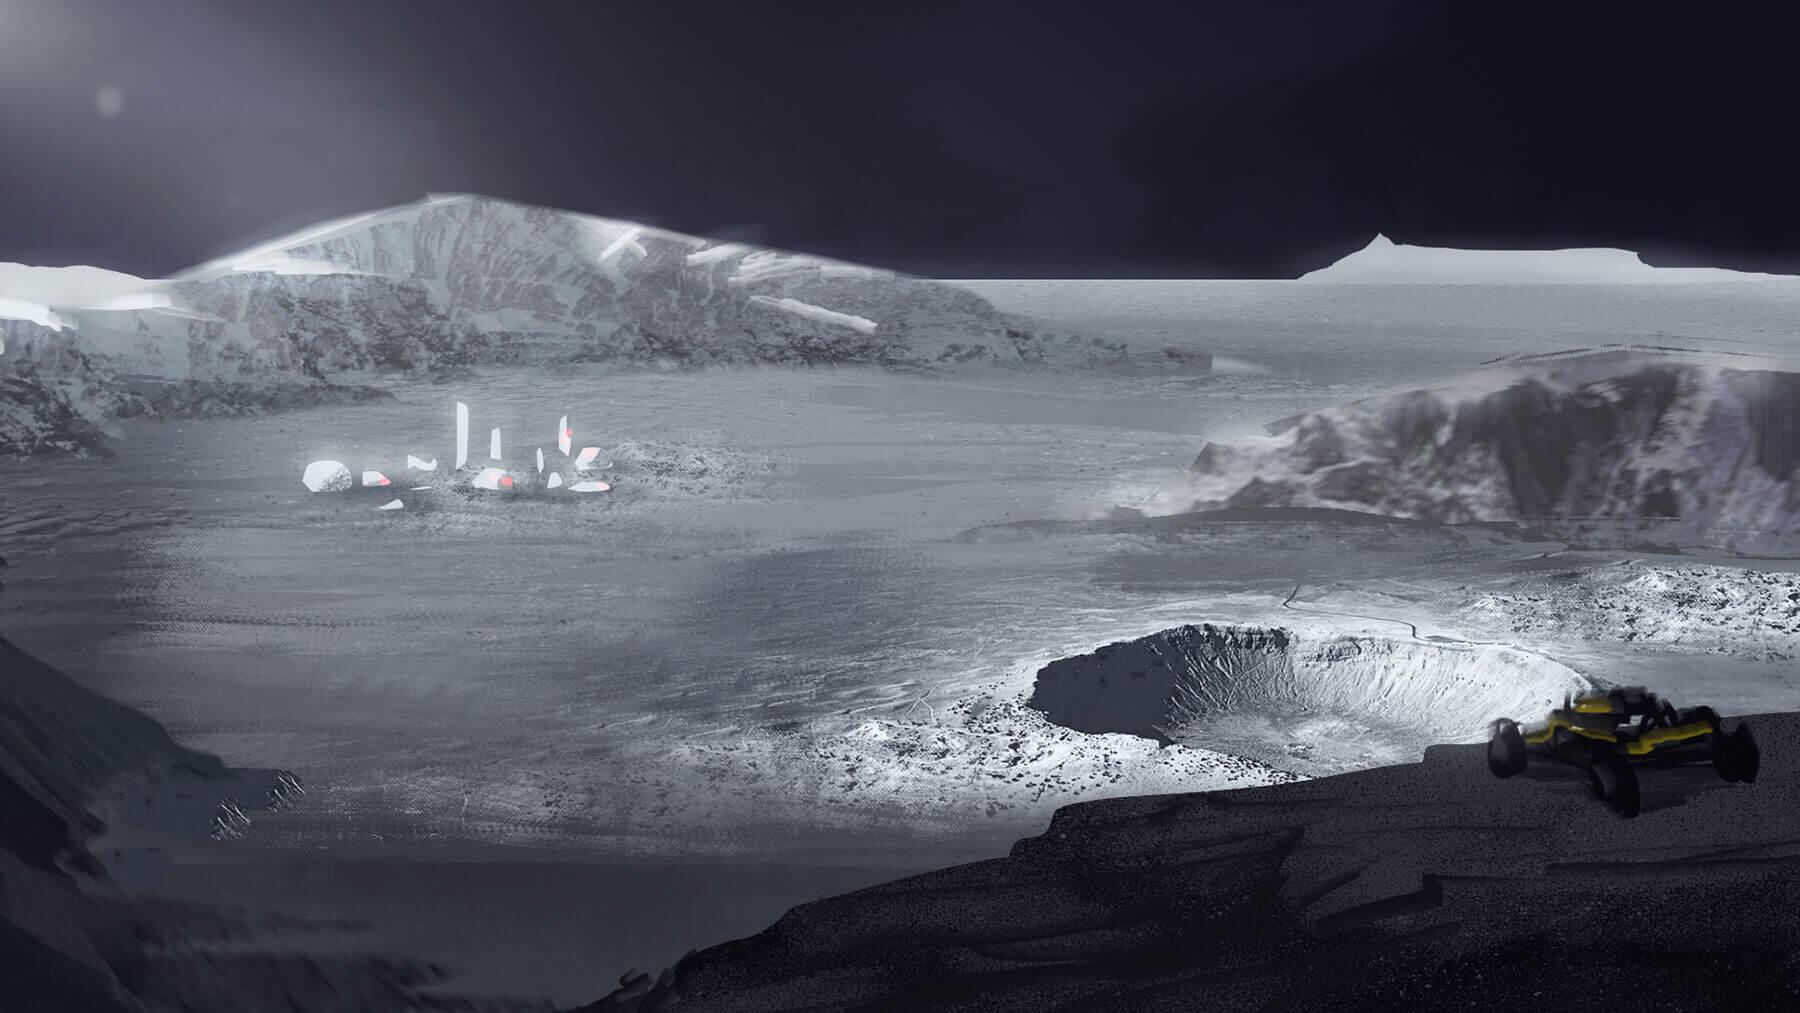 Virtual reality moon cliff overlook